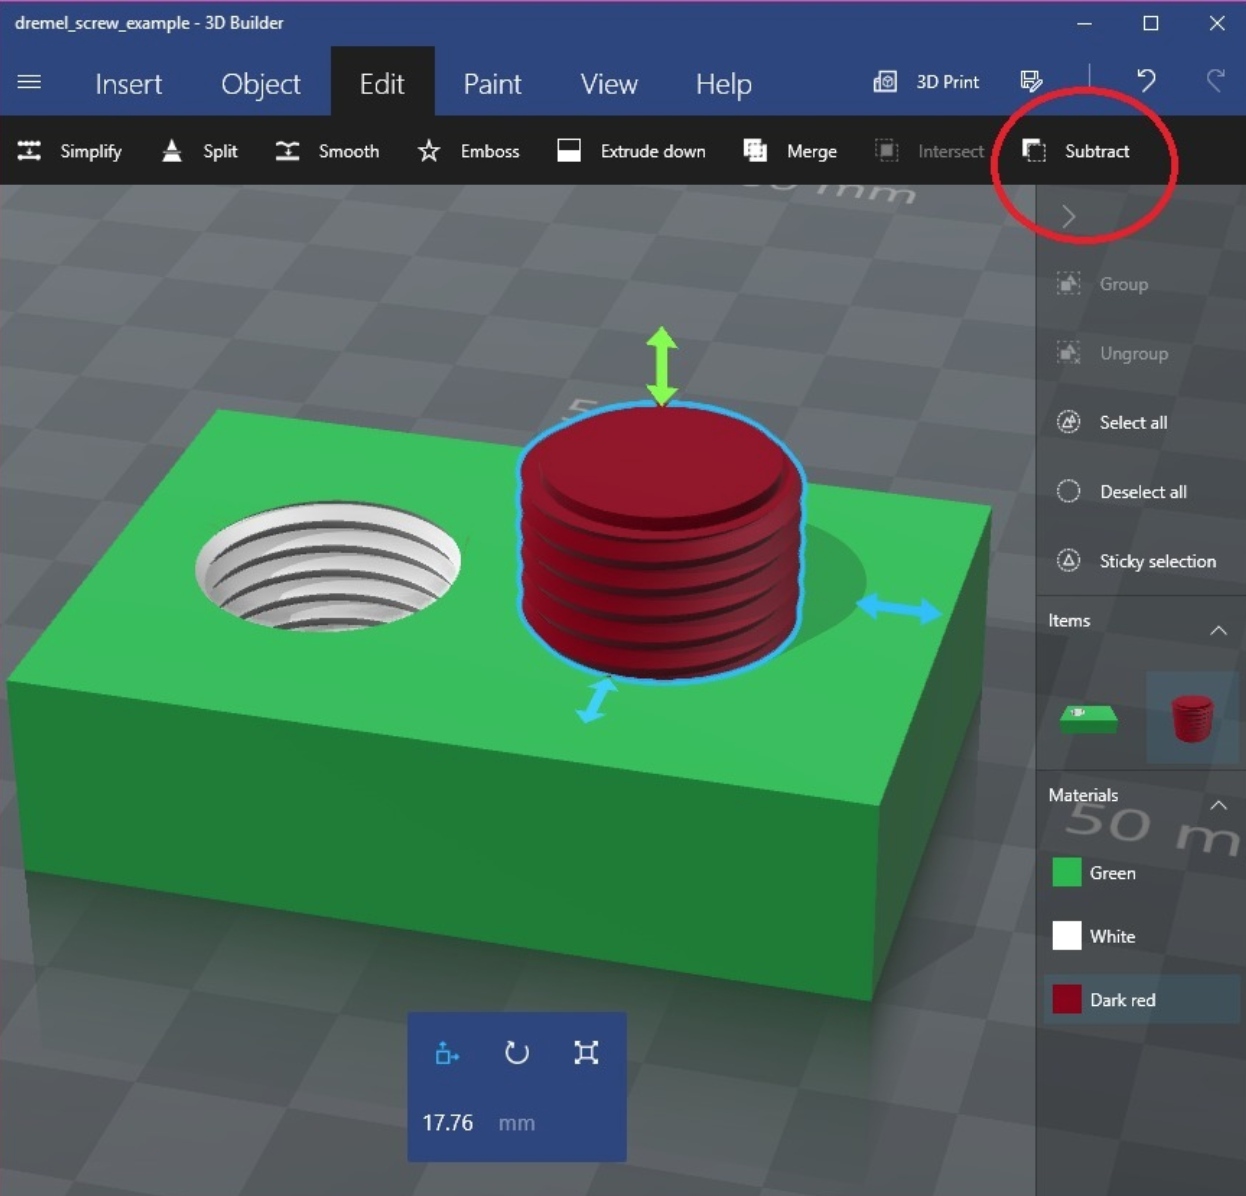 Capture d'écran 2017-10-07 à 18.44.06.png Download free STL file M19-2 Rotary Tool Thread • Design to 3D print, MGX